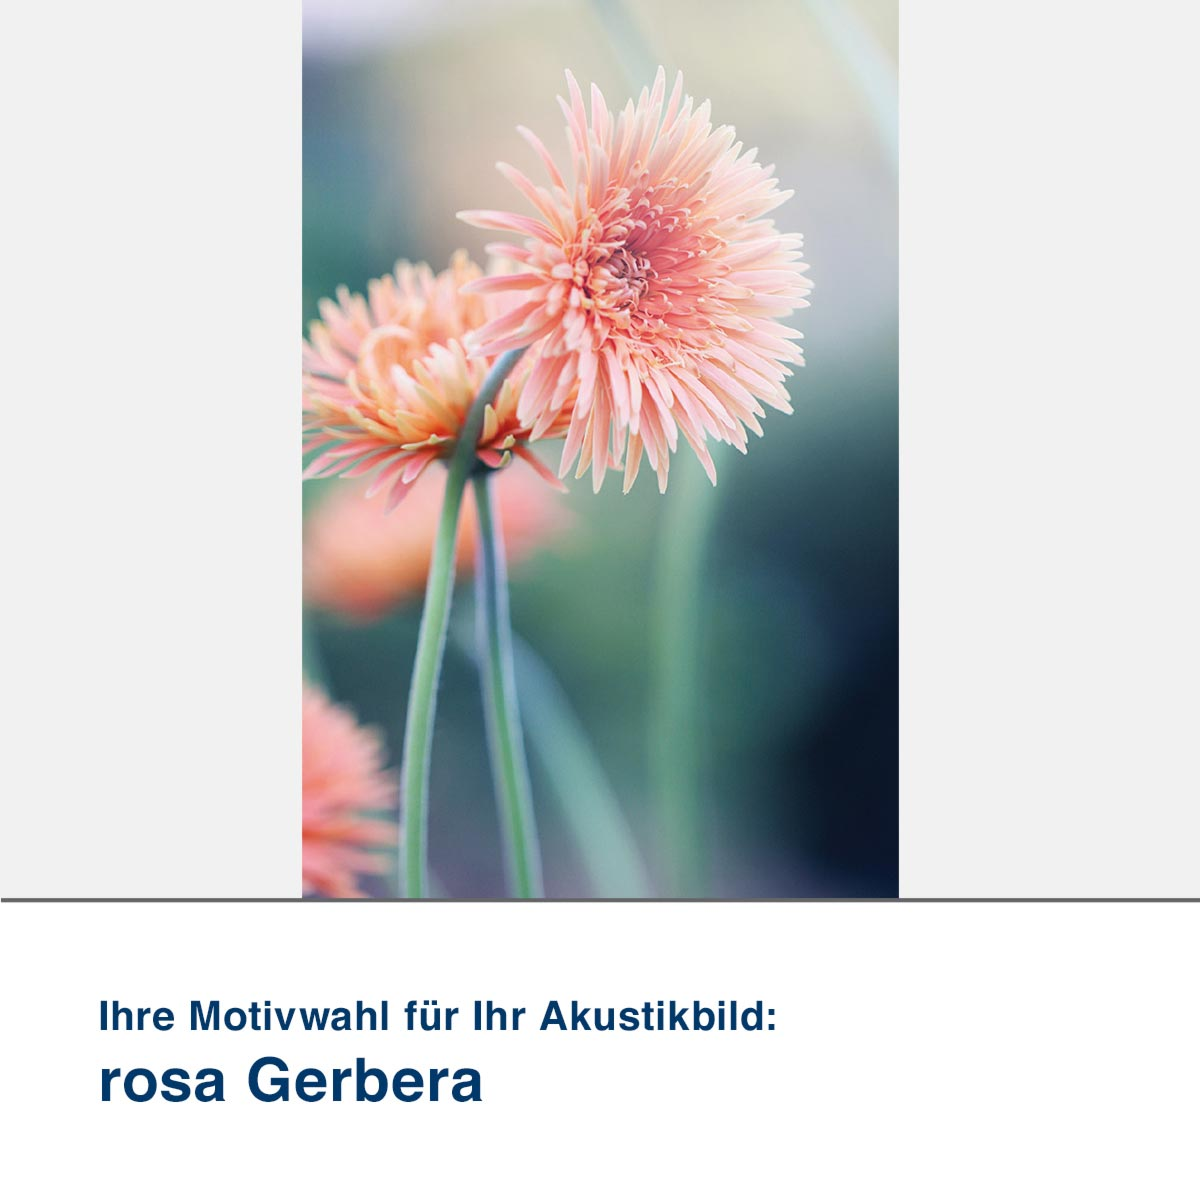 Akustikbild Motiv rosa Gerbera